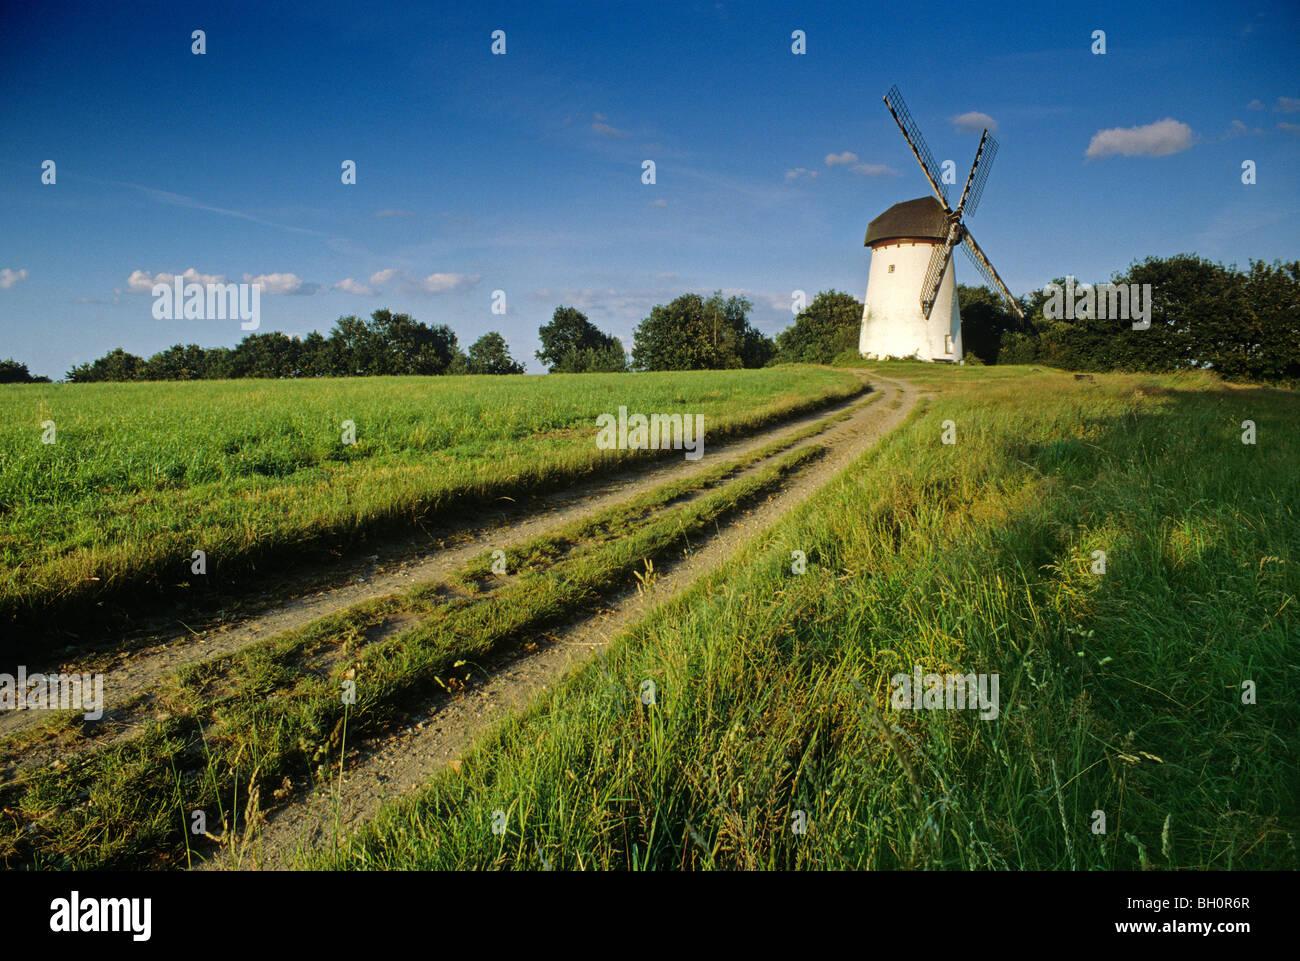 Engelsberg windmill, near Krefeld, Lower Rhine Region, North Rhine-Westphalia, Germany - Stock Image